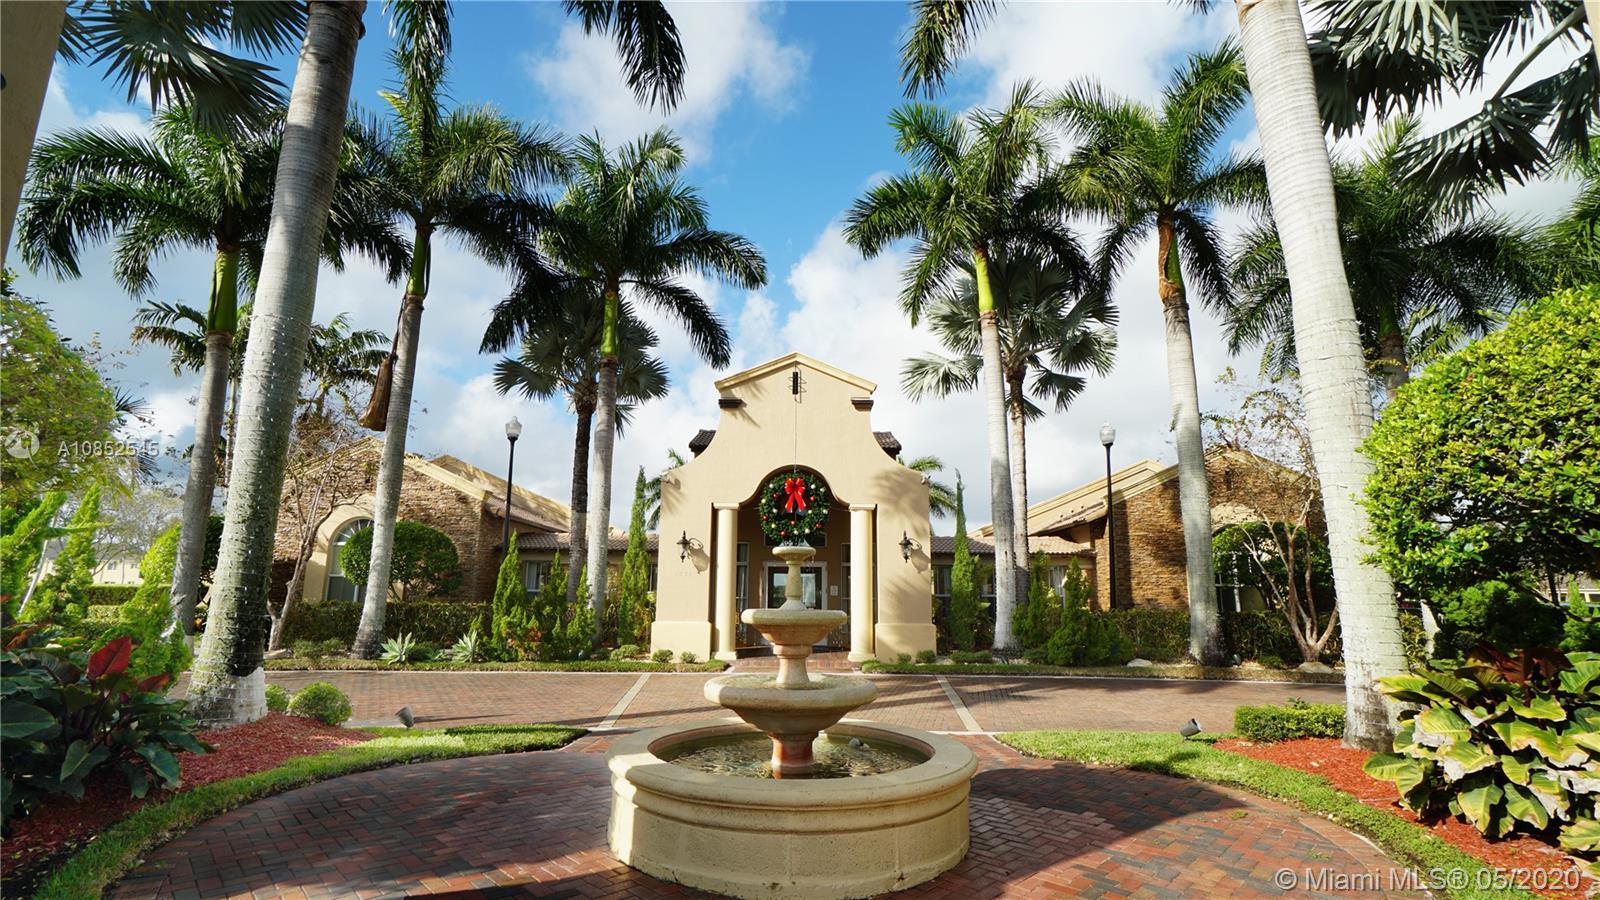 3390 NE 10th St #103, Homestead, FL 33033 - Homestead, FL real estate listing